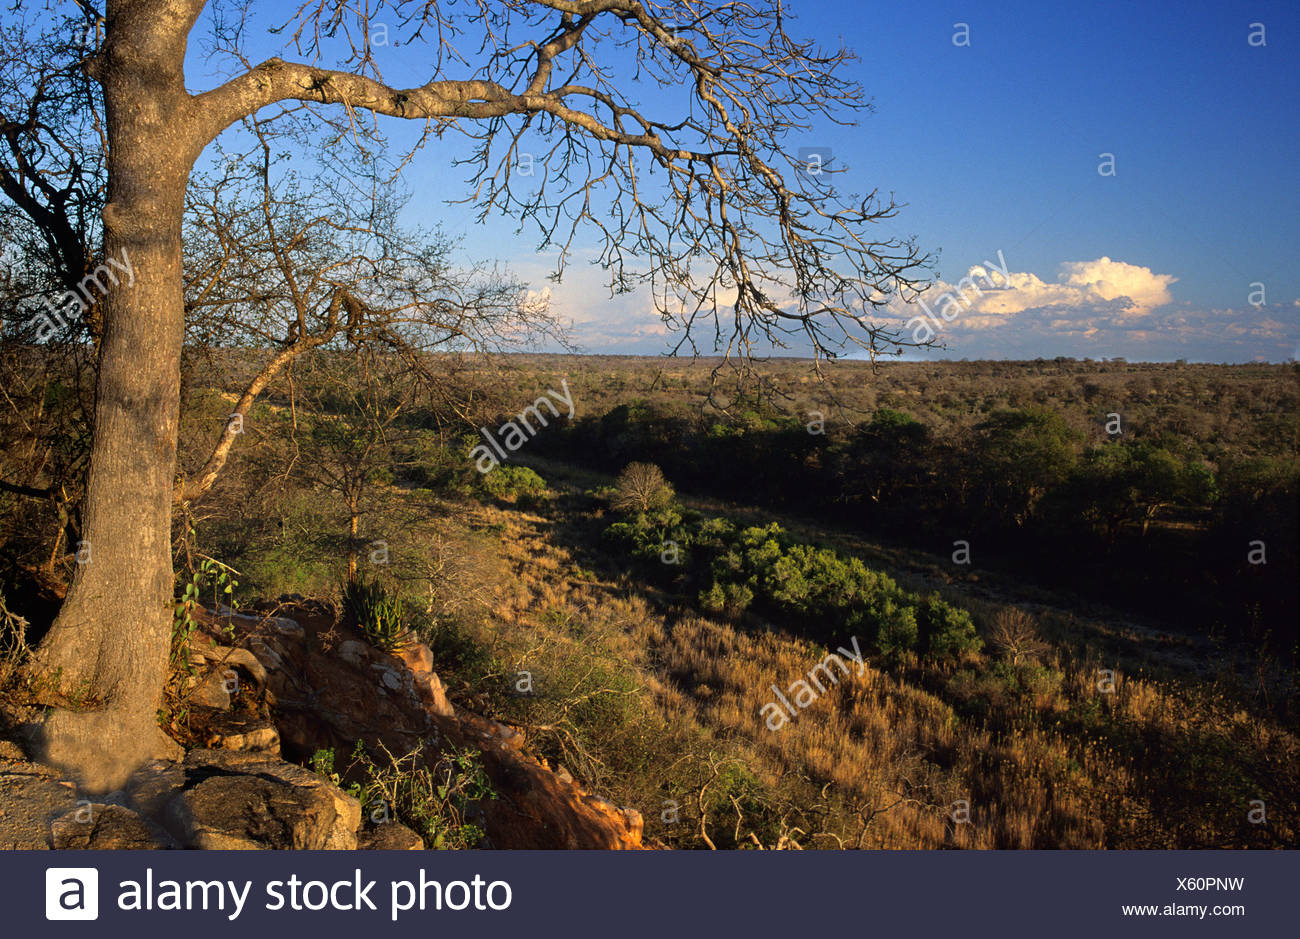 Bushveld in Timbavati area, Kruger National Park, South Africa - Stock Image